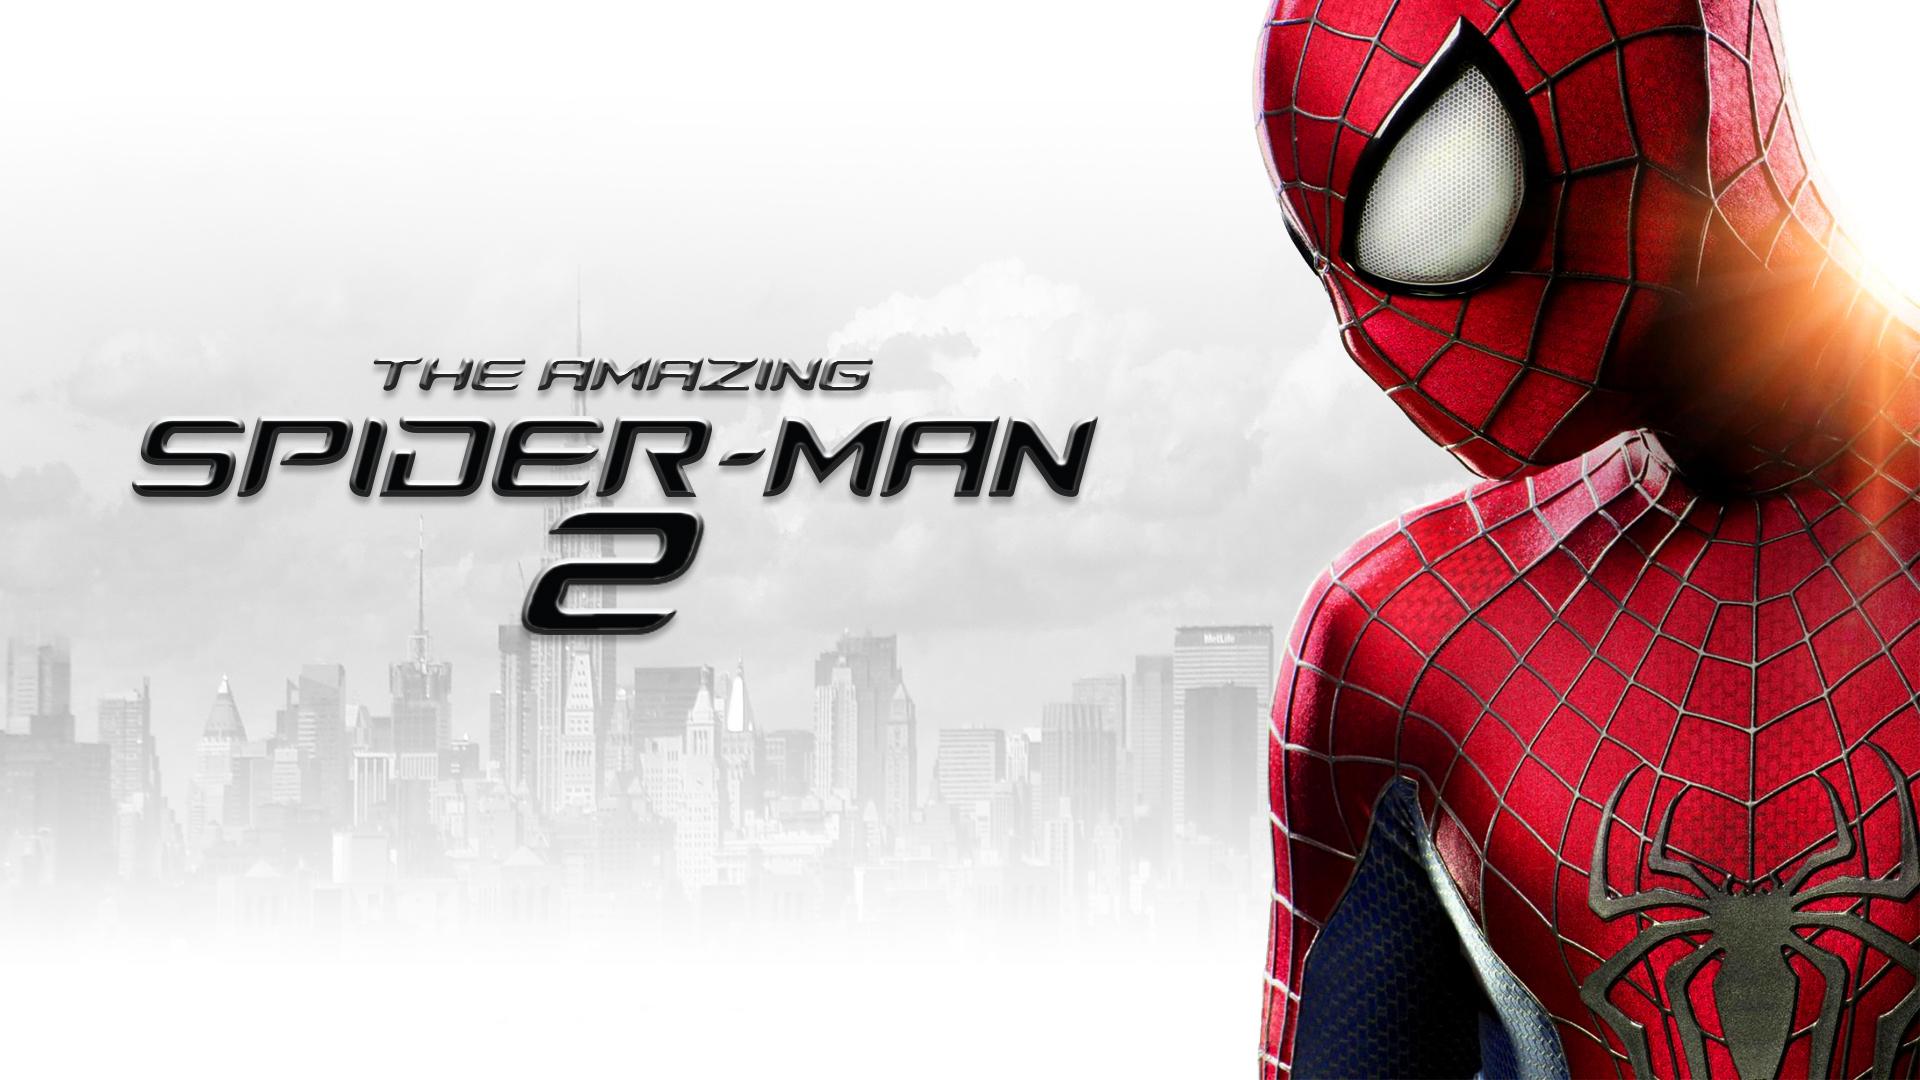 Spiderman Logo Wallpaper Hd 1080p The amazing spider man 2 2014 1920x1080